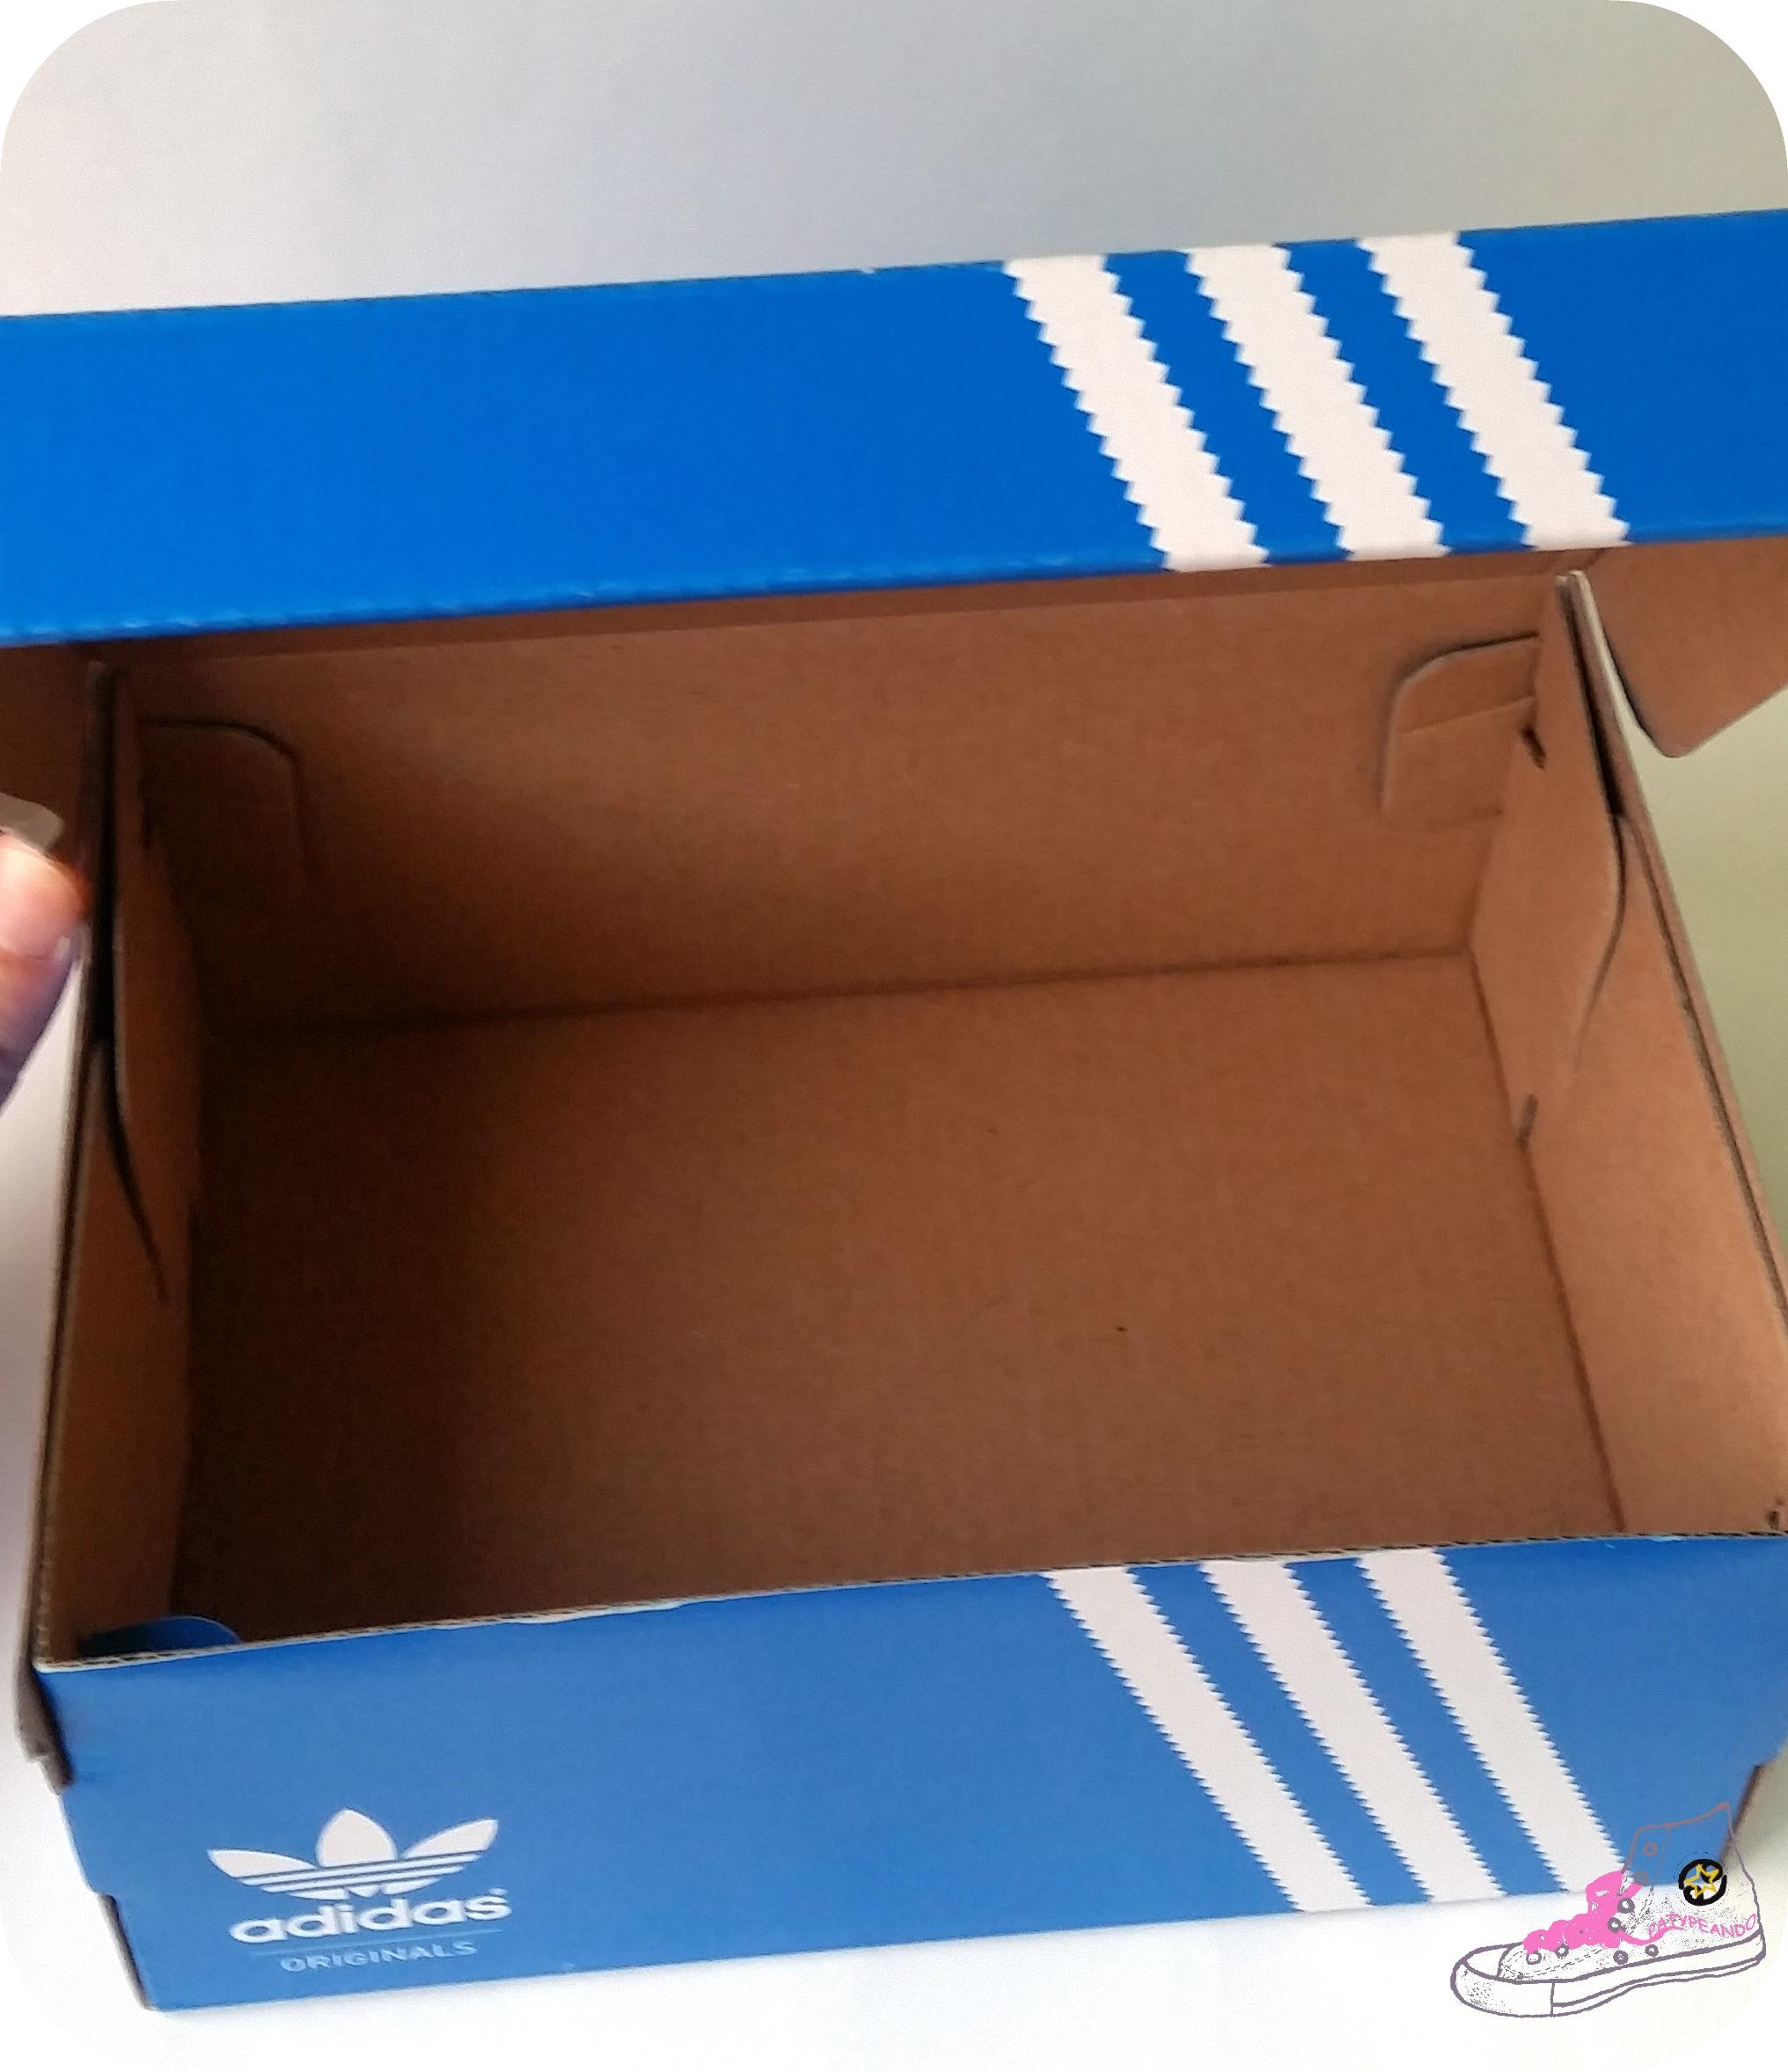 DIY - Hucha a partir de una caja de zapatos para ahorrar - HANDBOX 74191a66b22